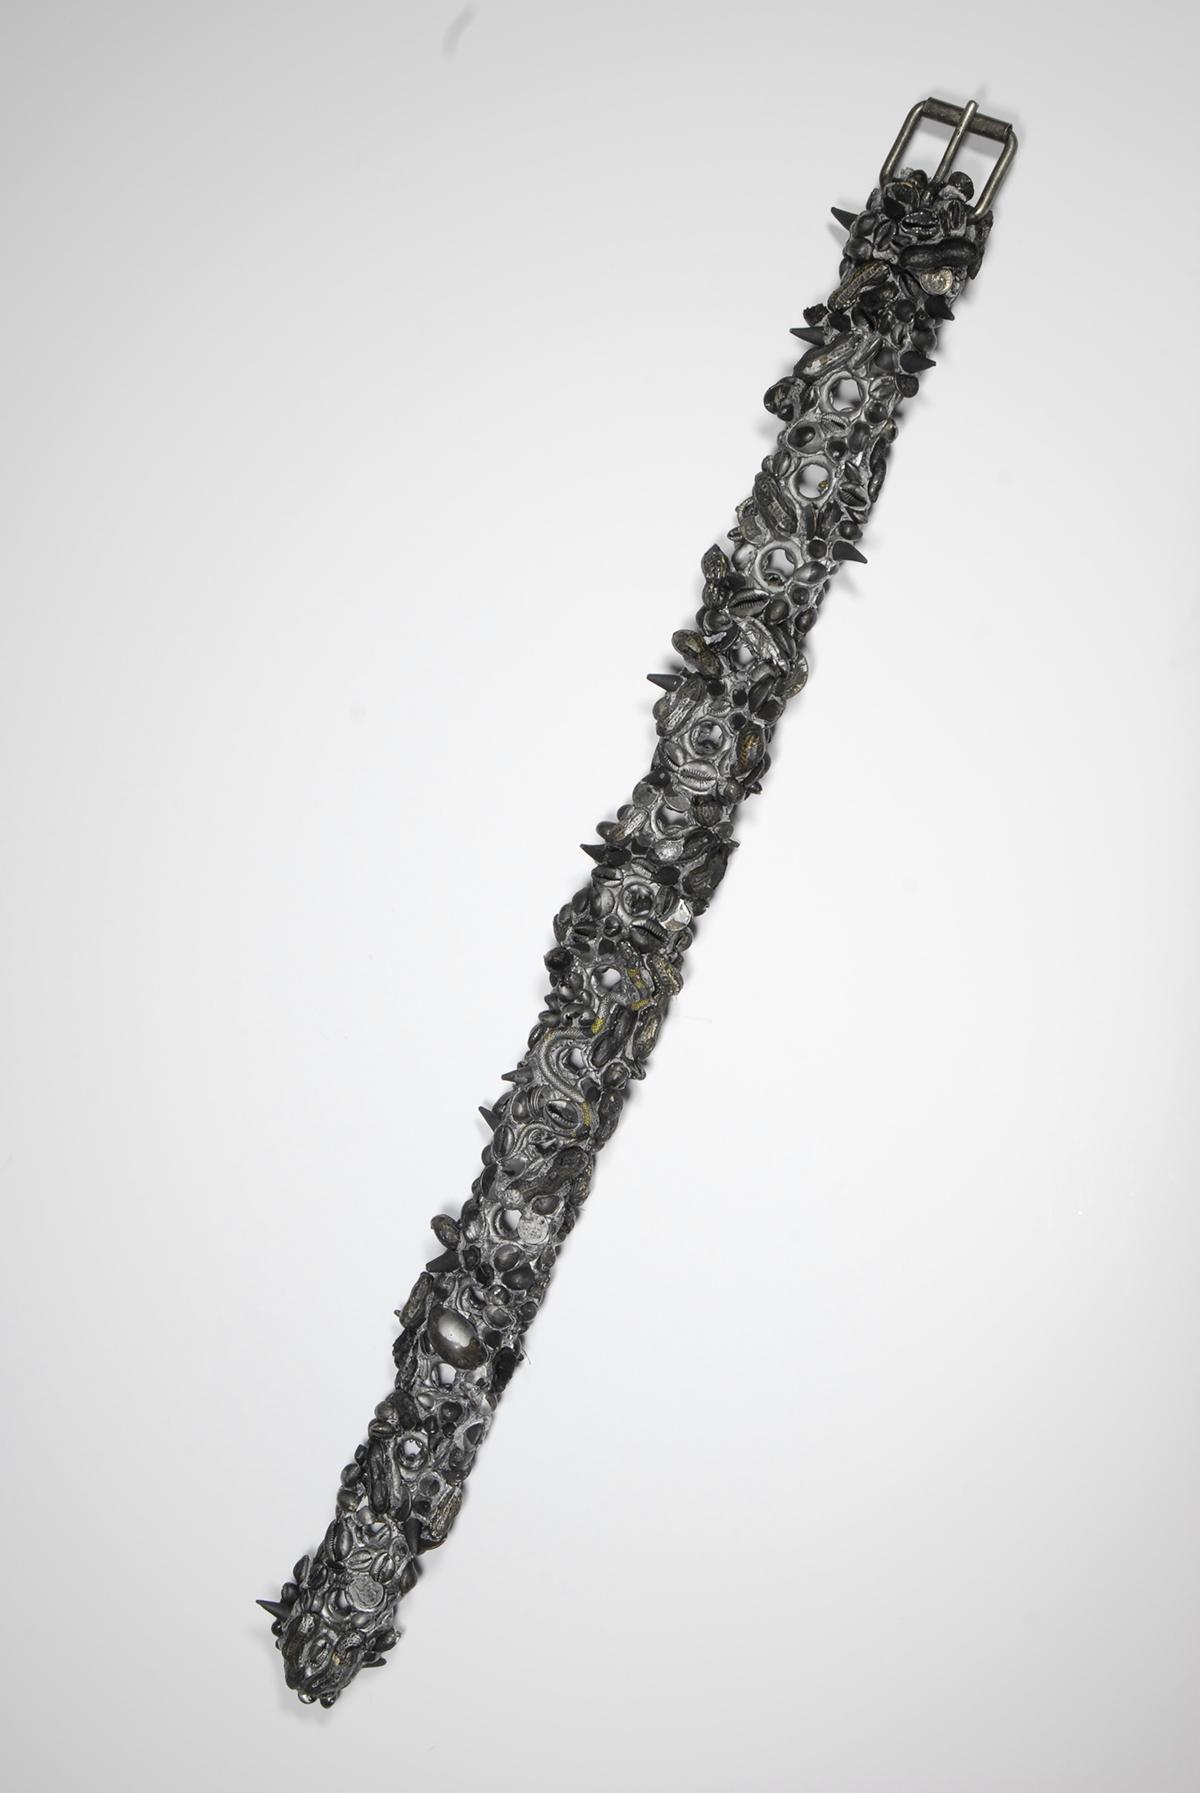 A.K. Burns, Katherine Hubbard, Belt, In Spirit Of, Sculpture